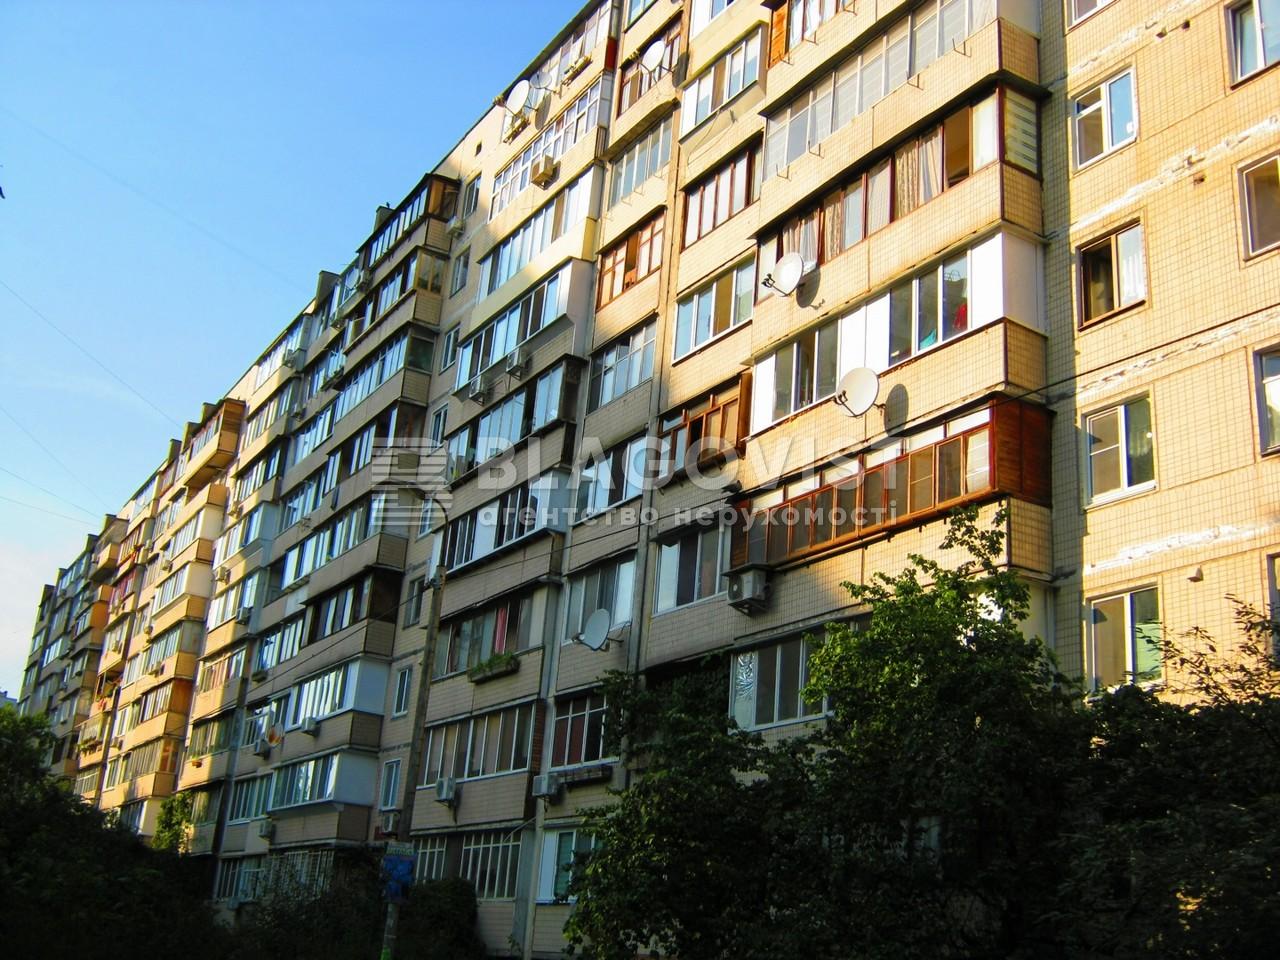 Квартира A-109123, Харківське шосе, 174б, Київ - Фото 1